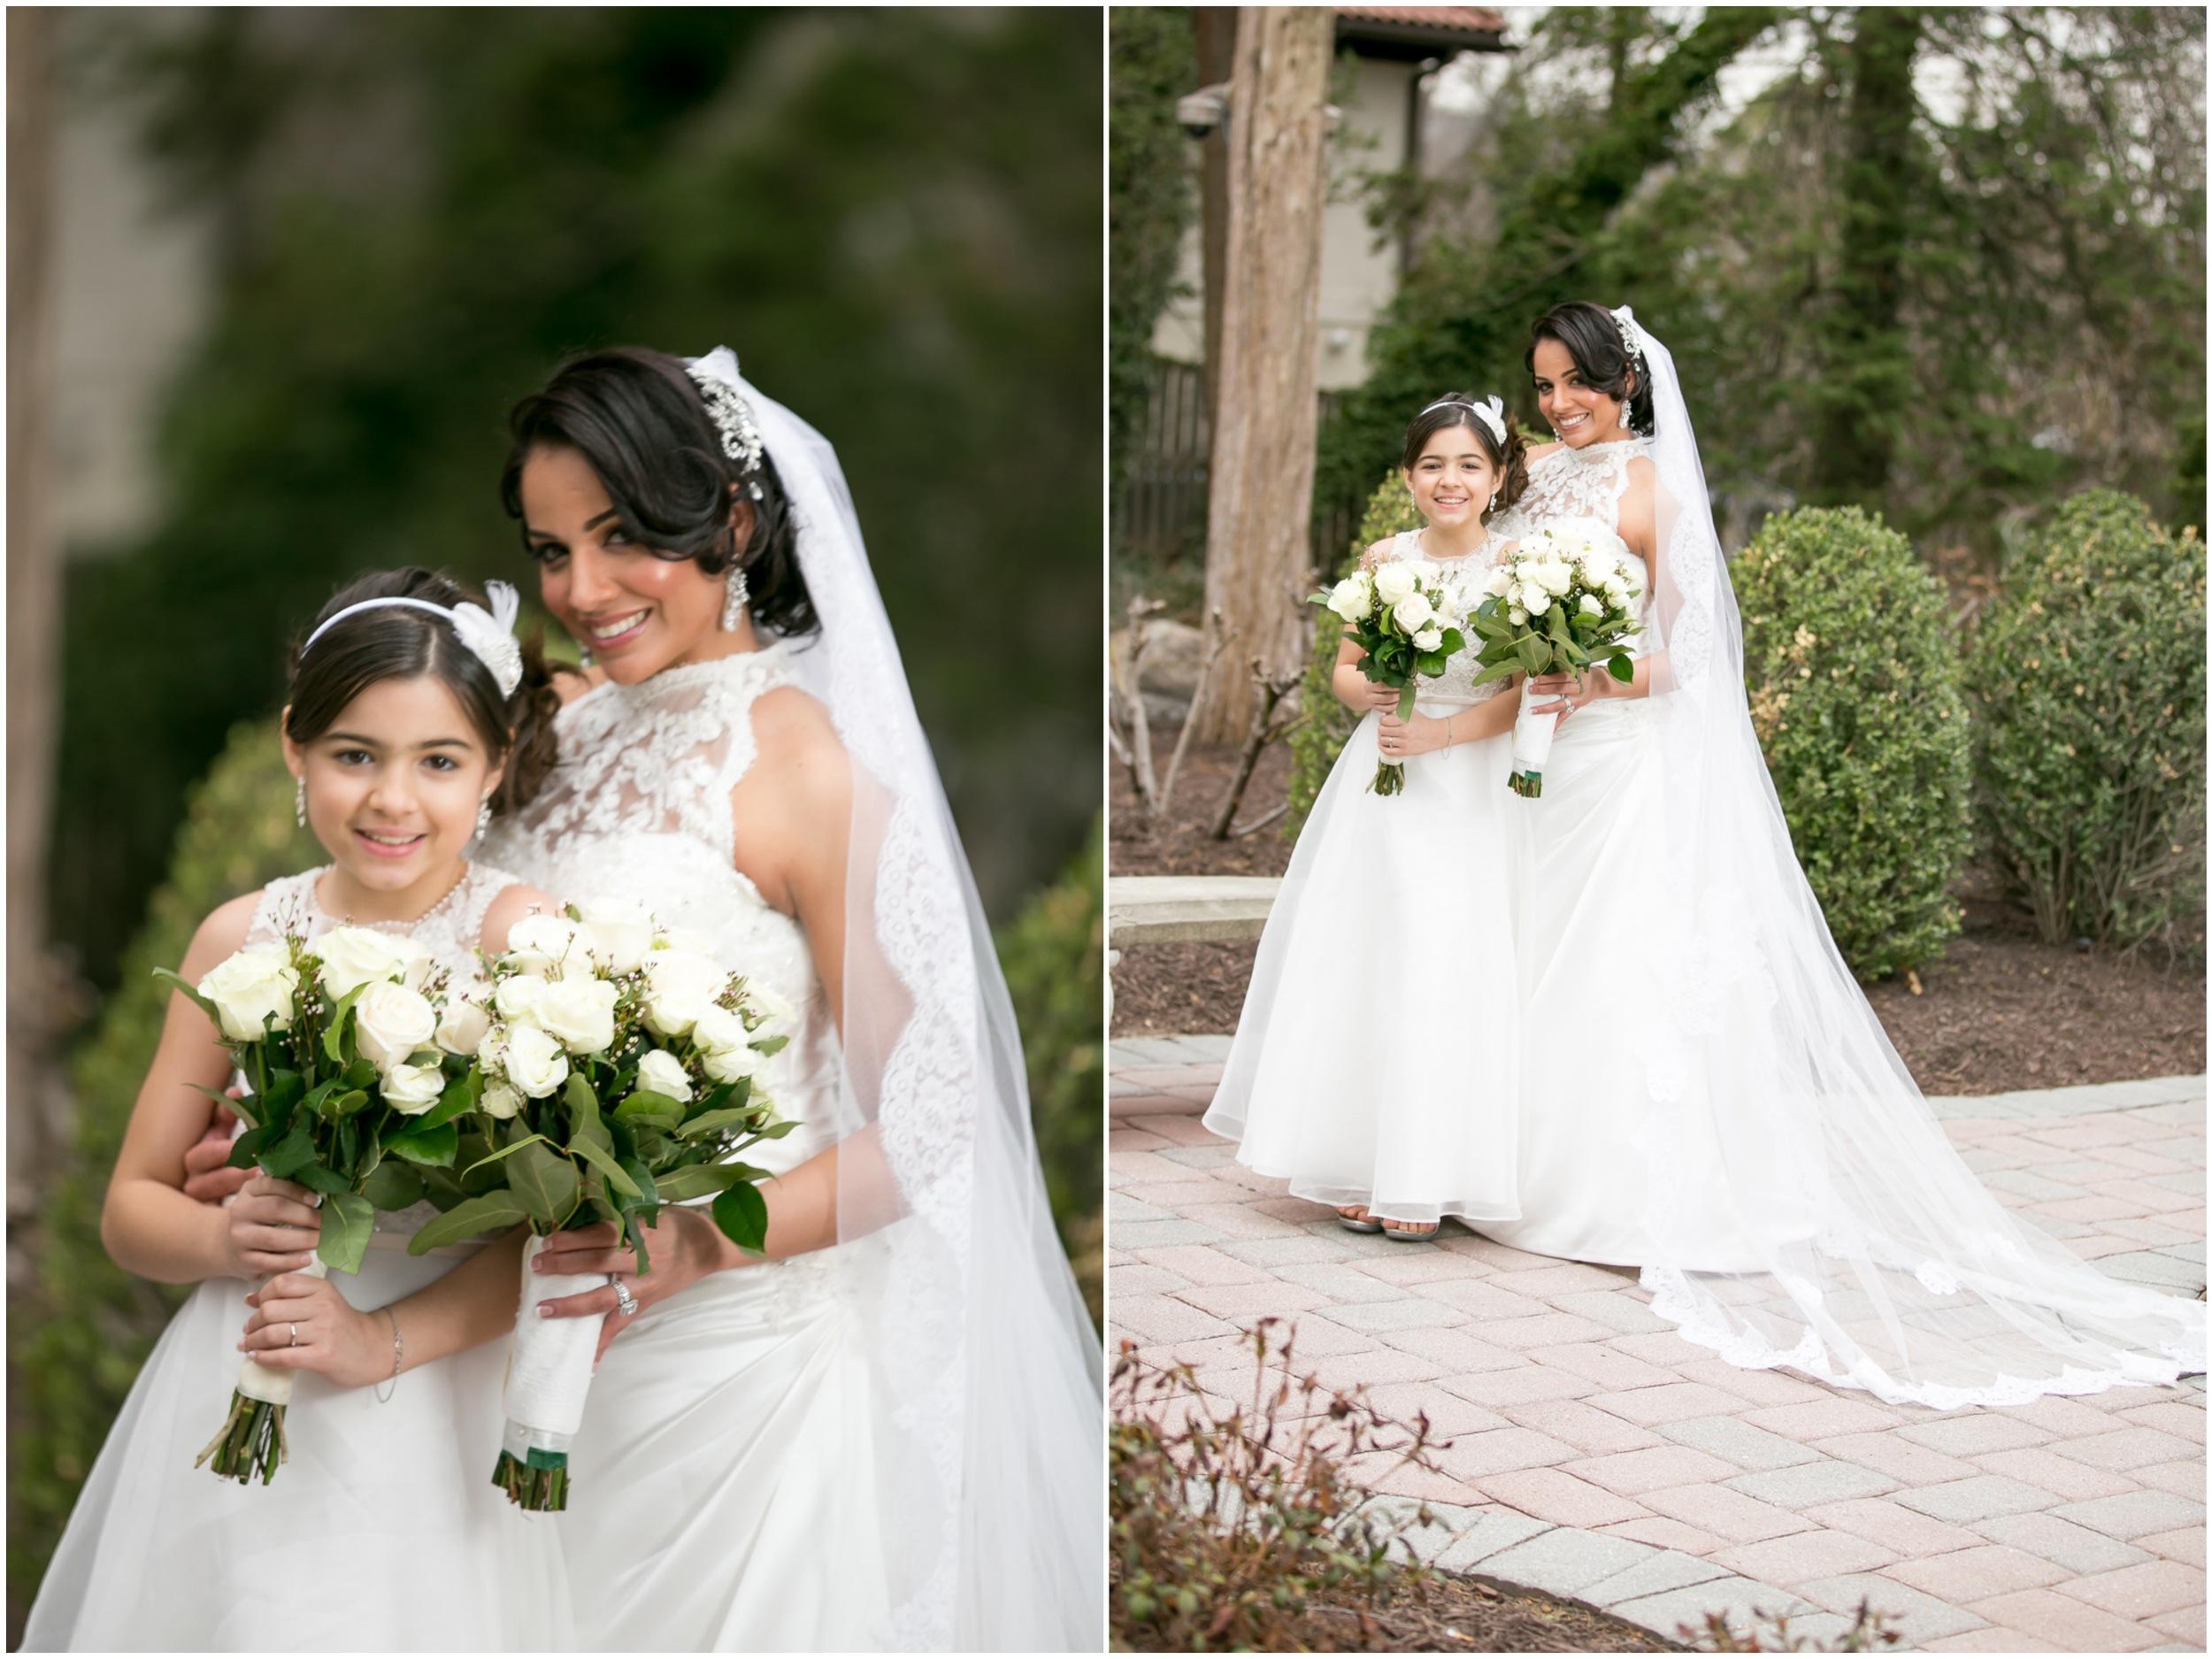 Bradly-and-Jesenia-Wedding-Collage-19.jpg